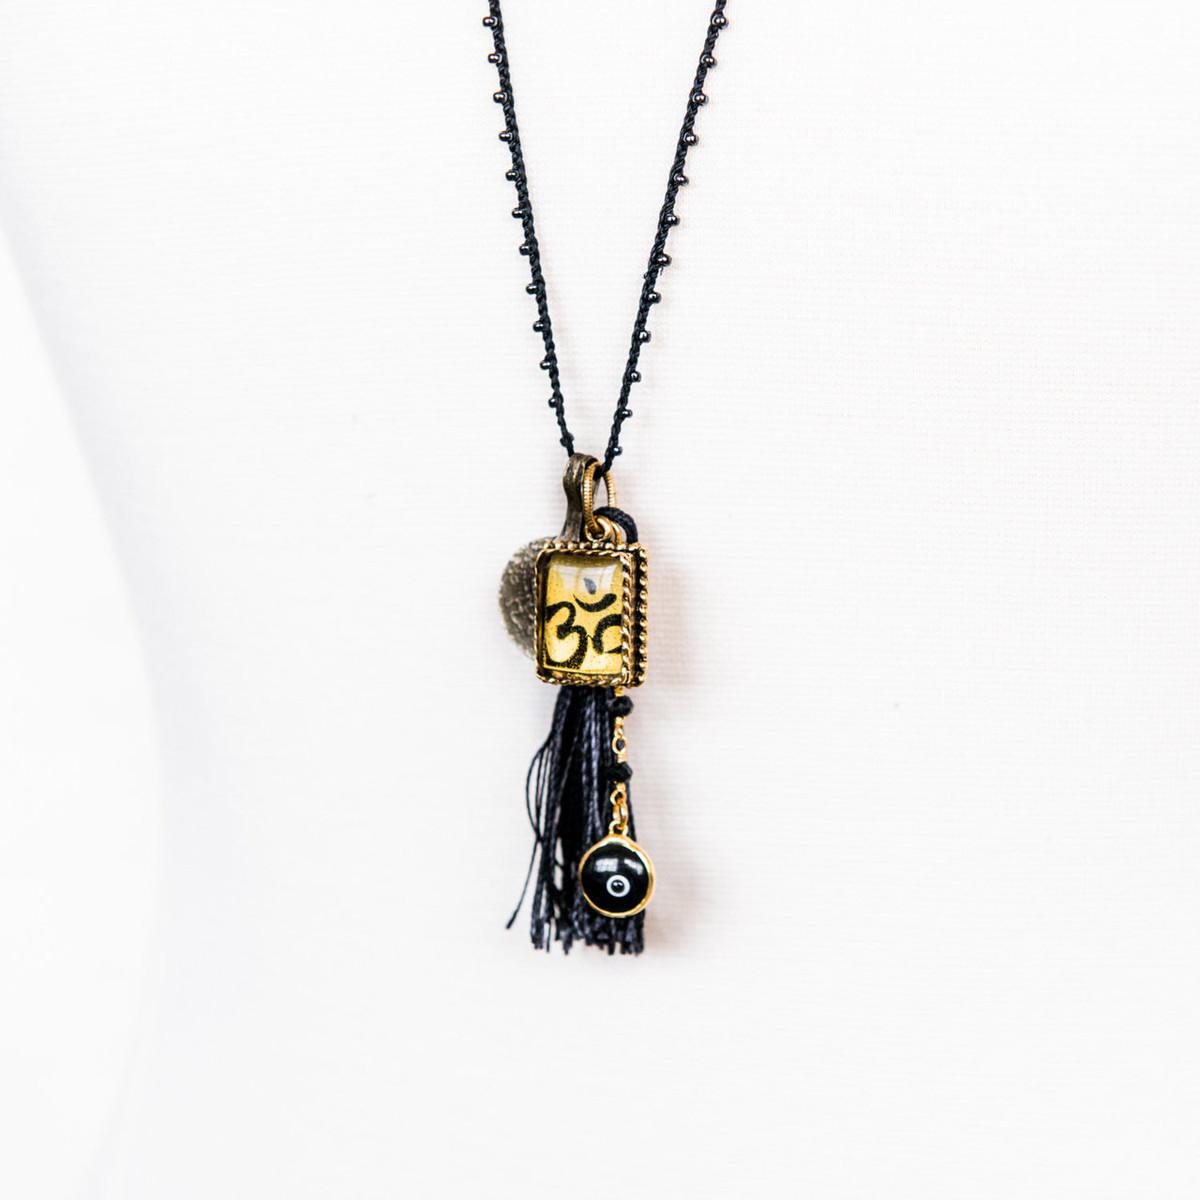 7Stitches Beaded Zen Black Necklace